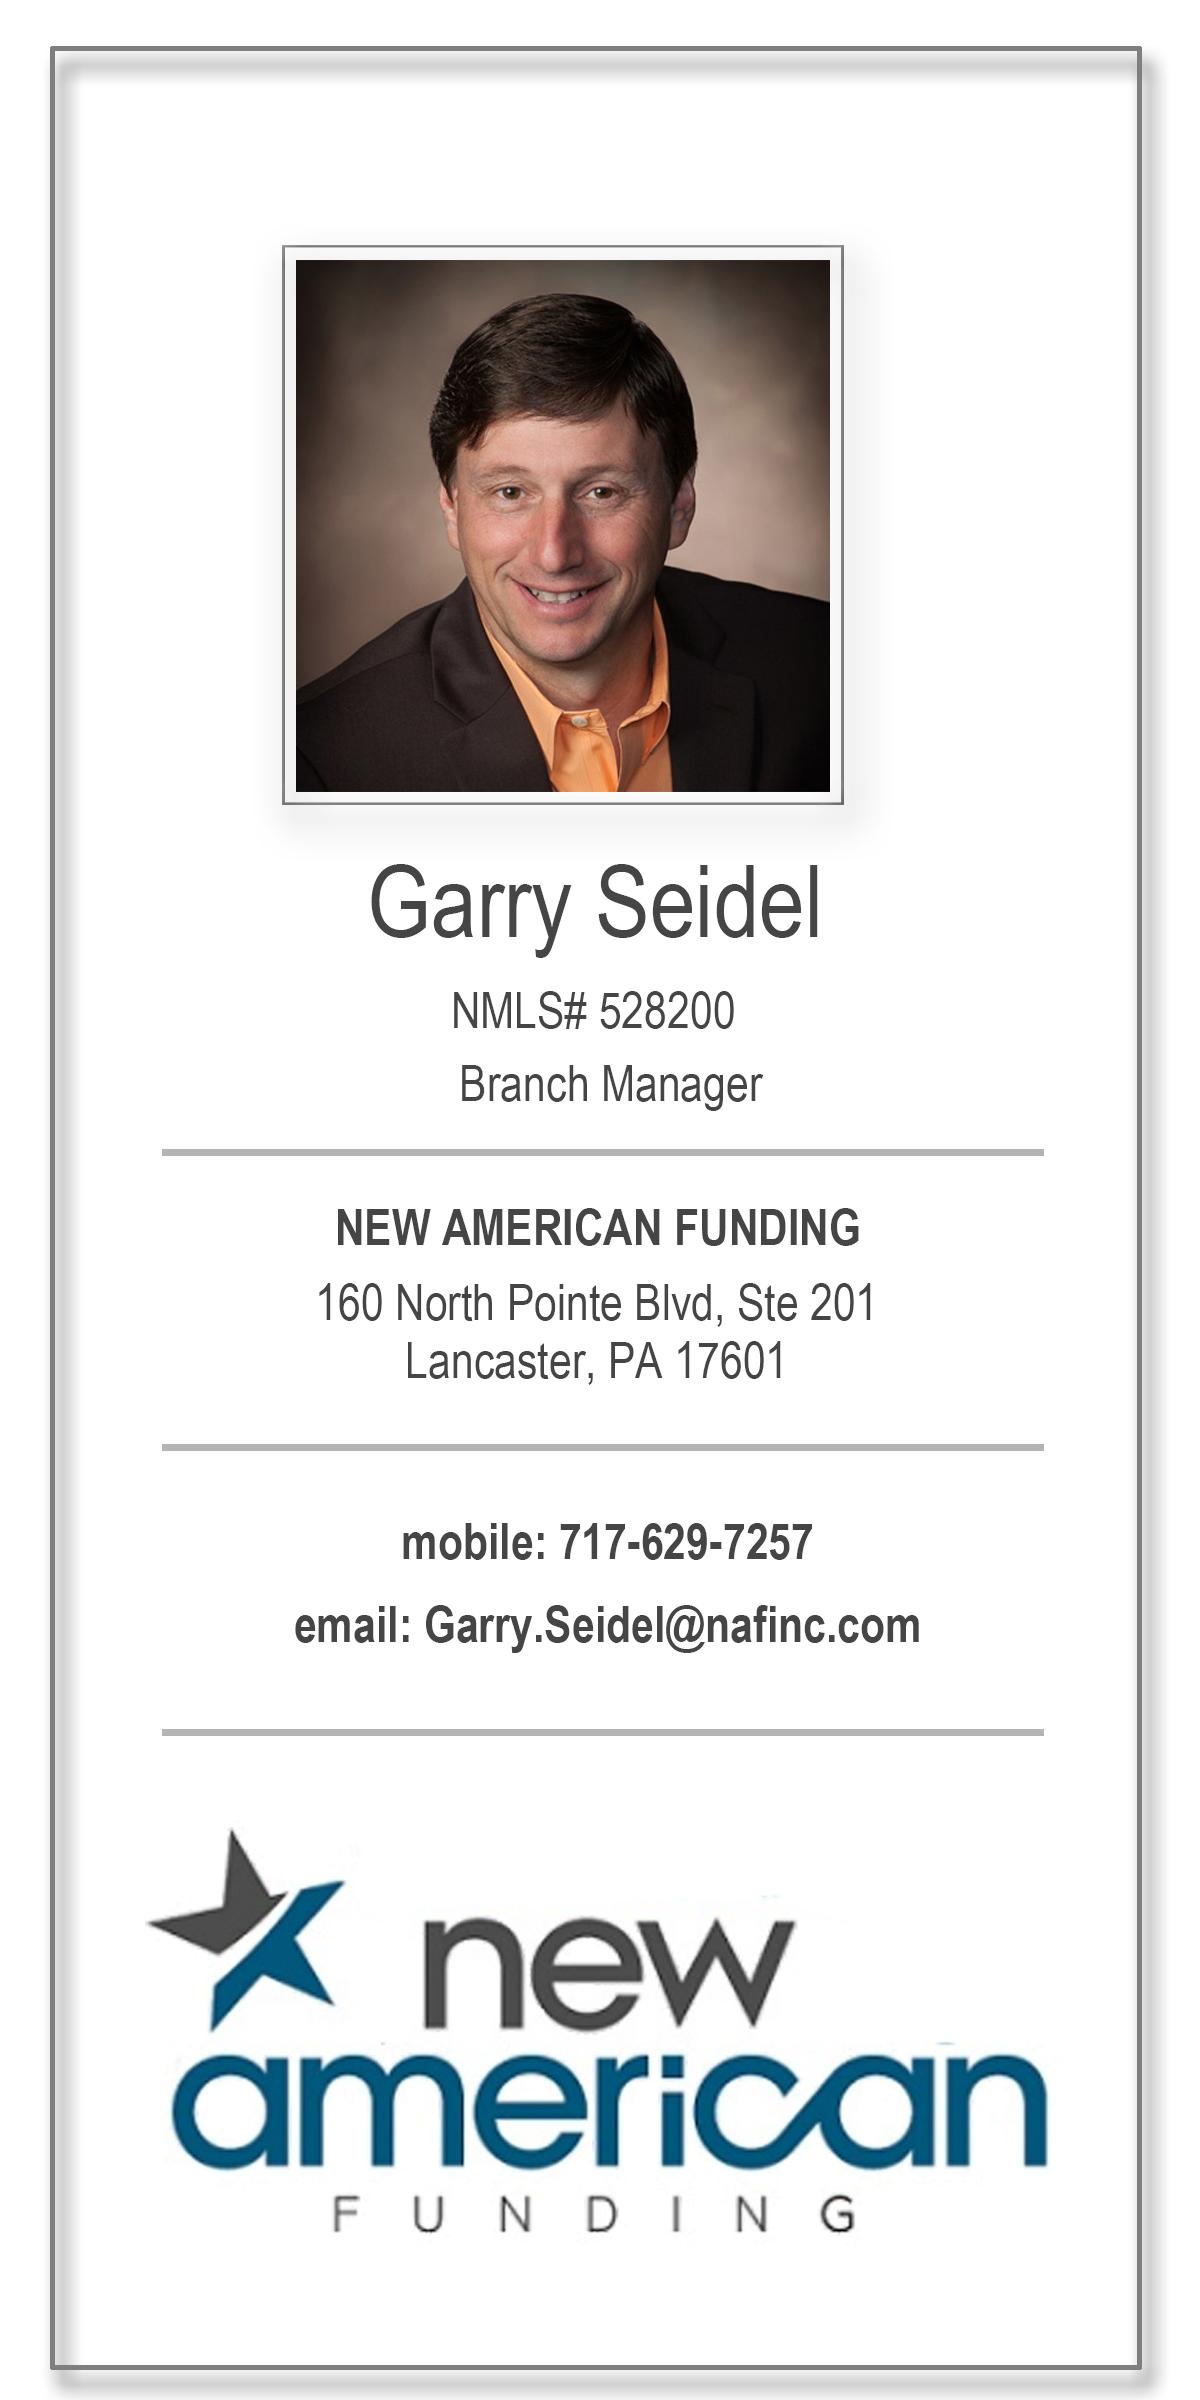 Garry Seidel New American Funding